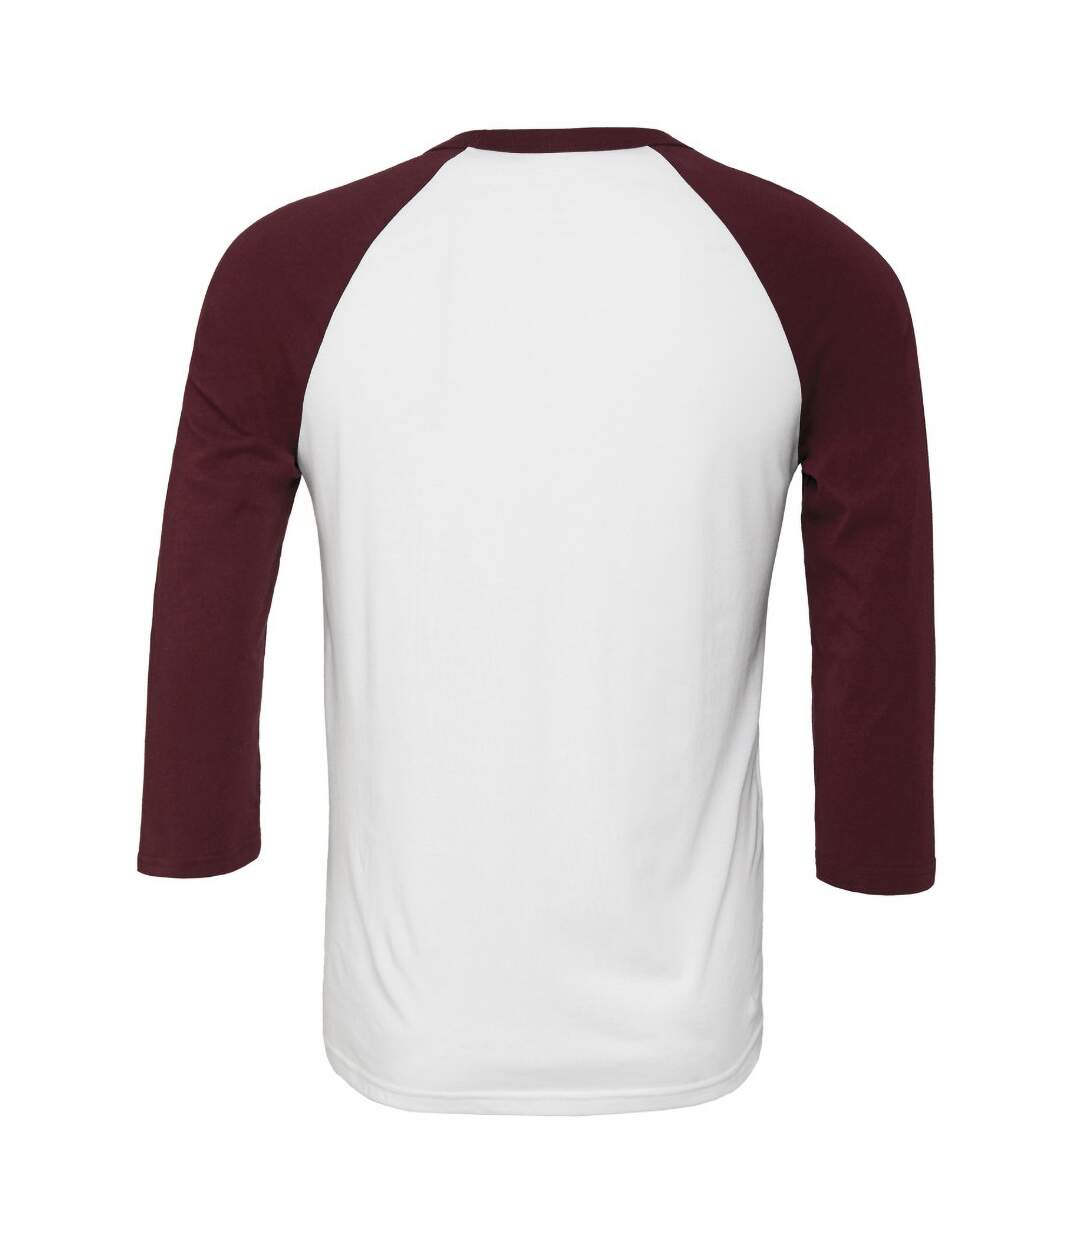 Canvas Mens 3/4 Sleeve Baseball T-Shirt (White/Navy) - UTBC1332